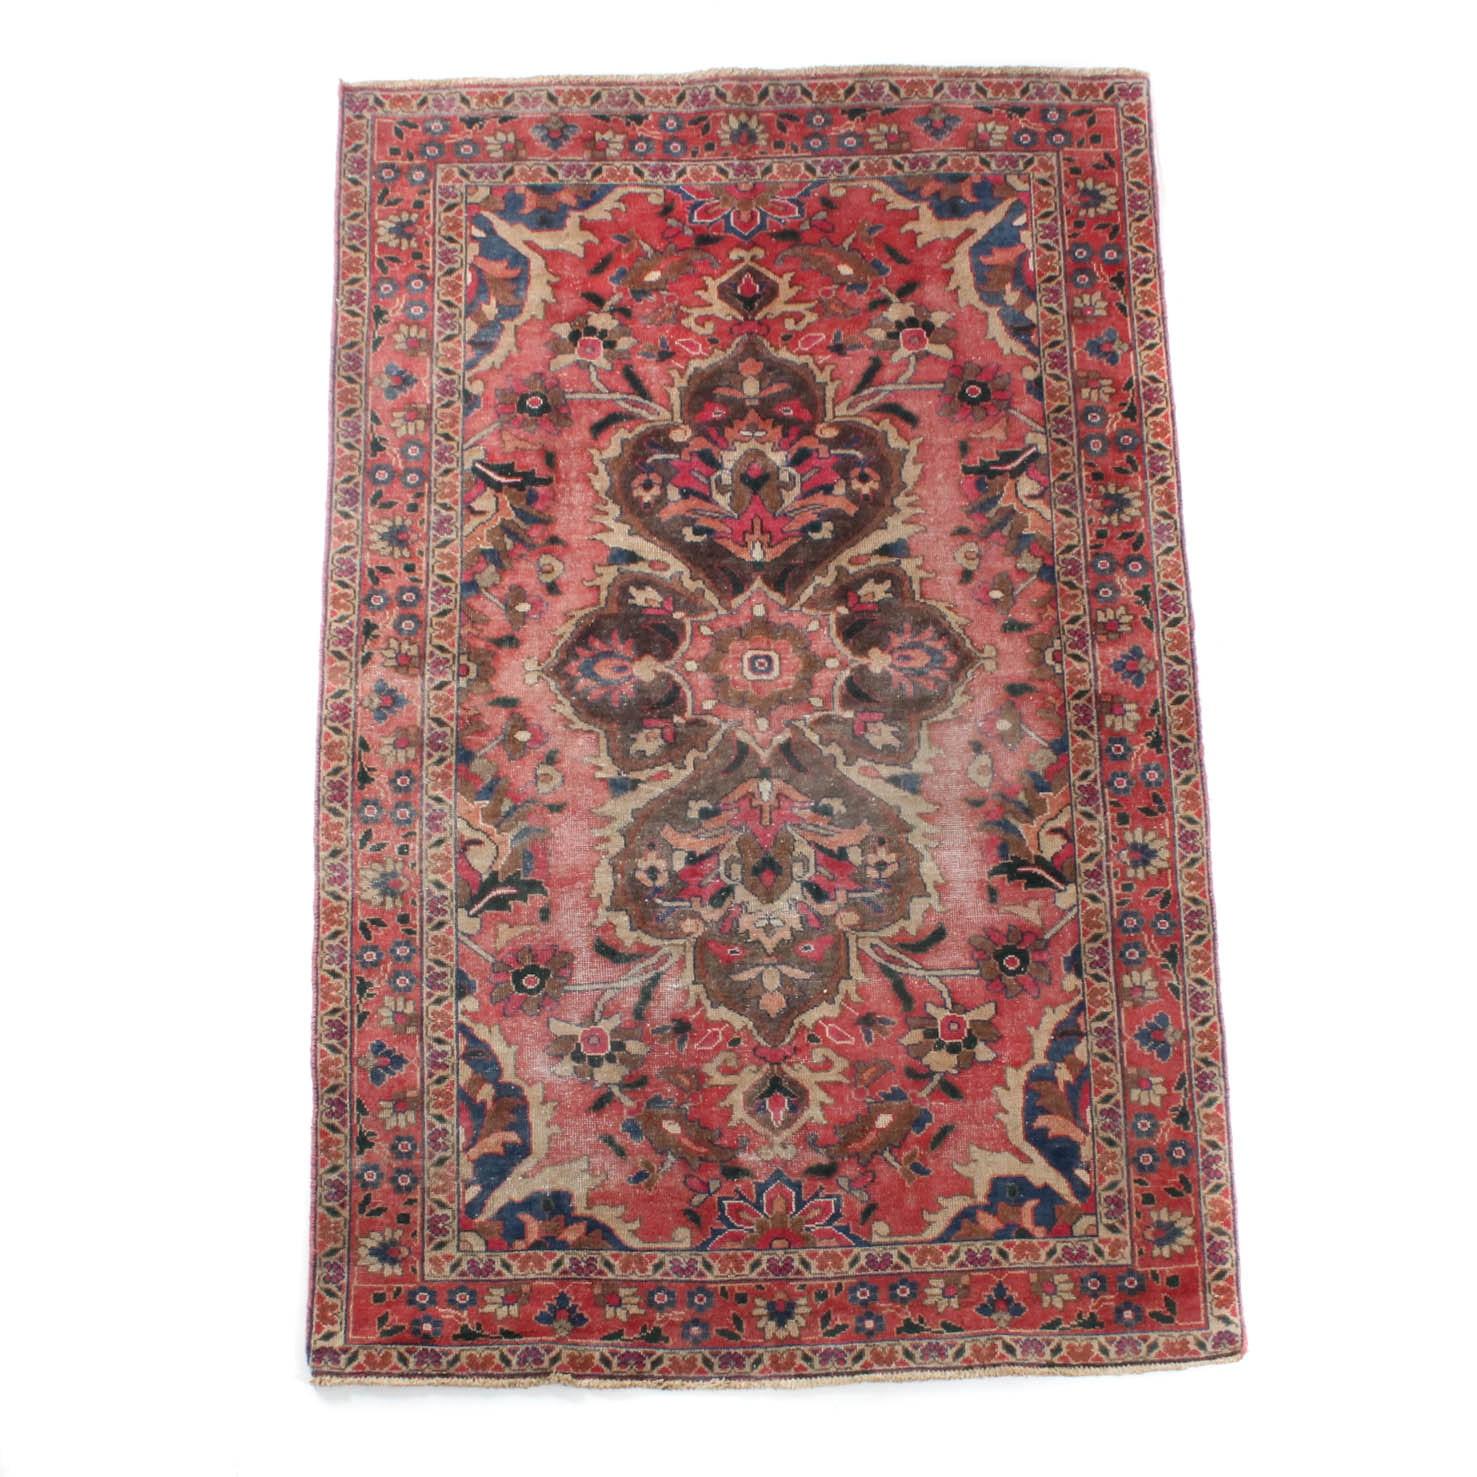 Vintage Handwoven Persian Mahal Sarouk Wool Area Rug